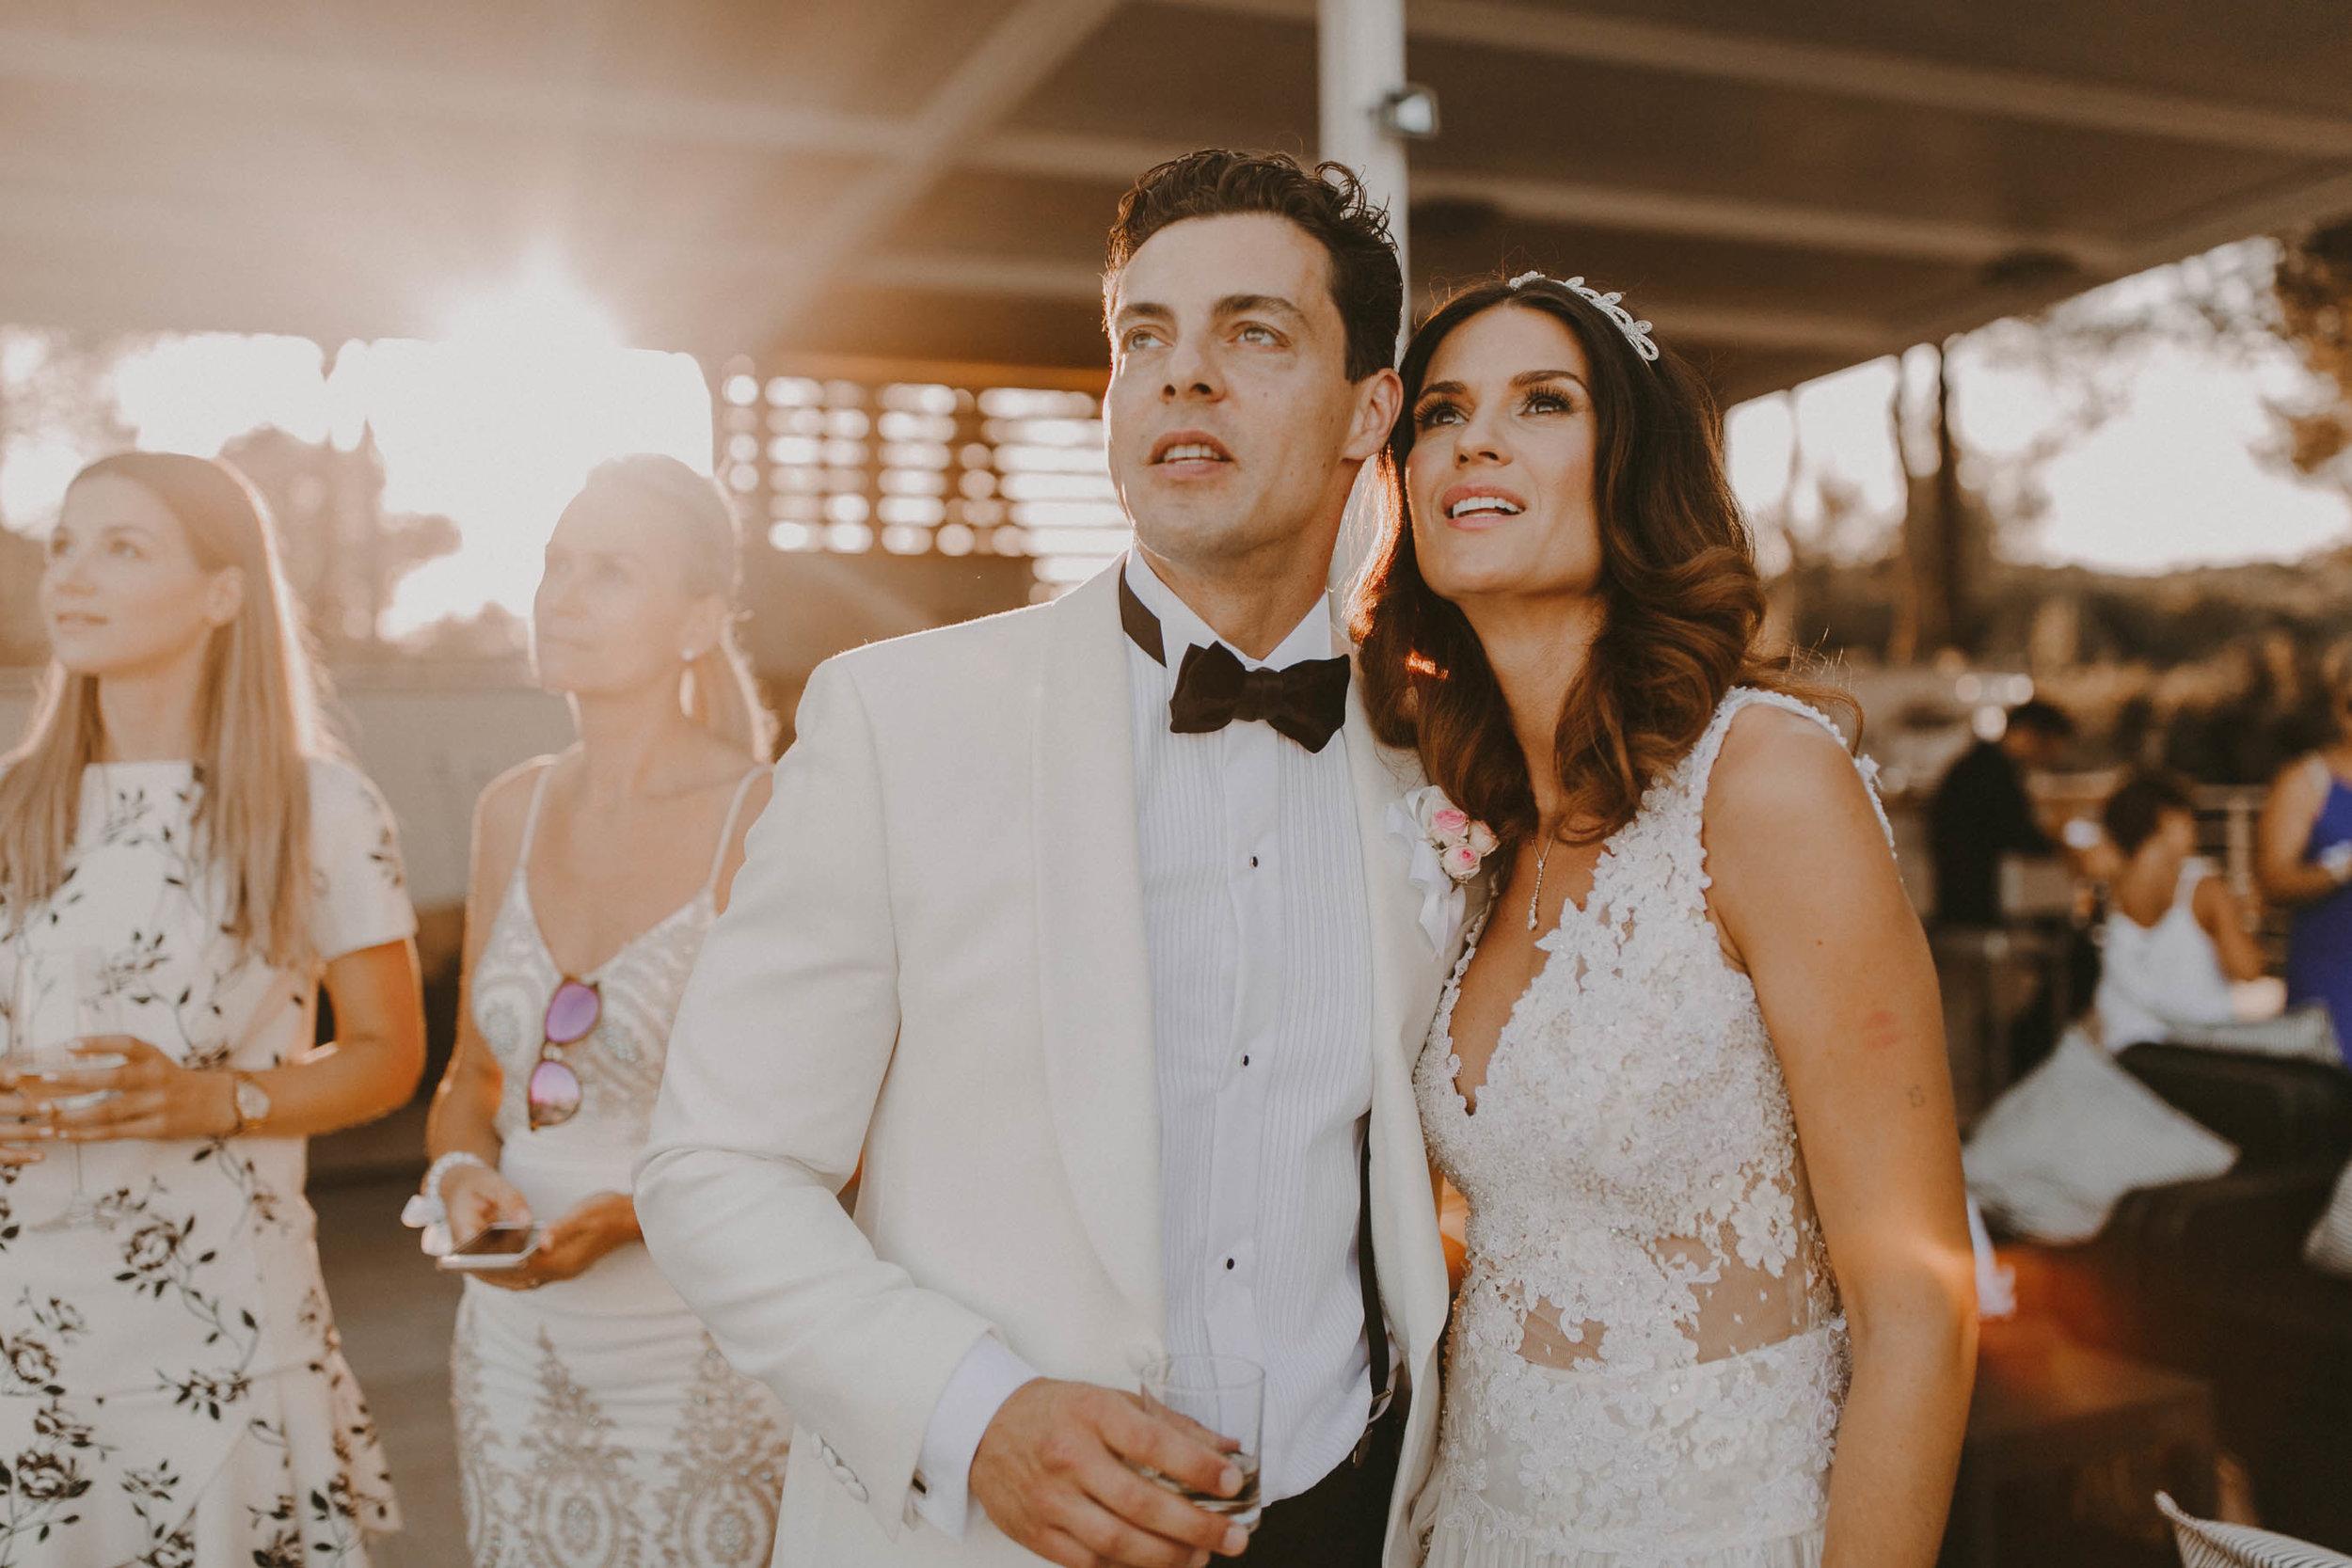 sylvia&dimitri-Wedding-Crvena_Luka-Croatia-58(8161).jpg